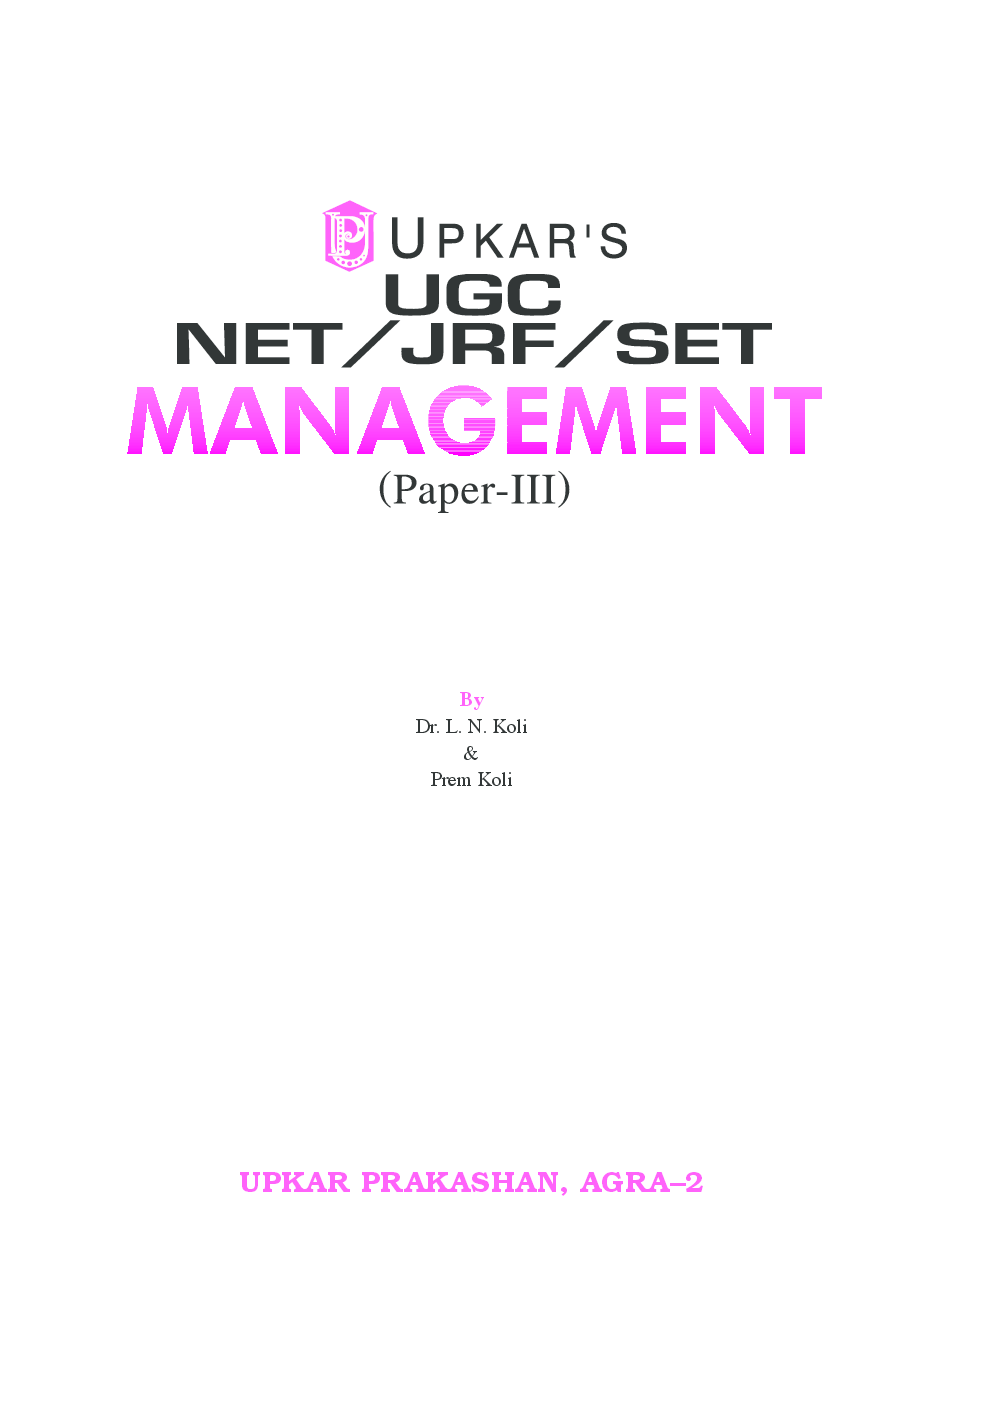 Download UGC NET/JRF/SET Management (Paper III) With